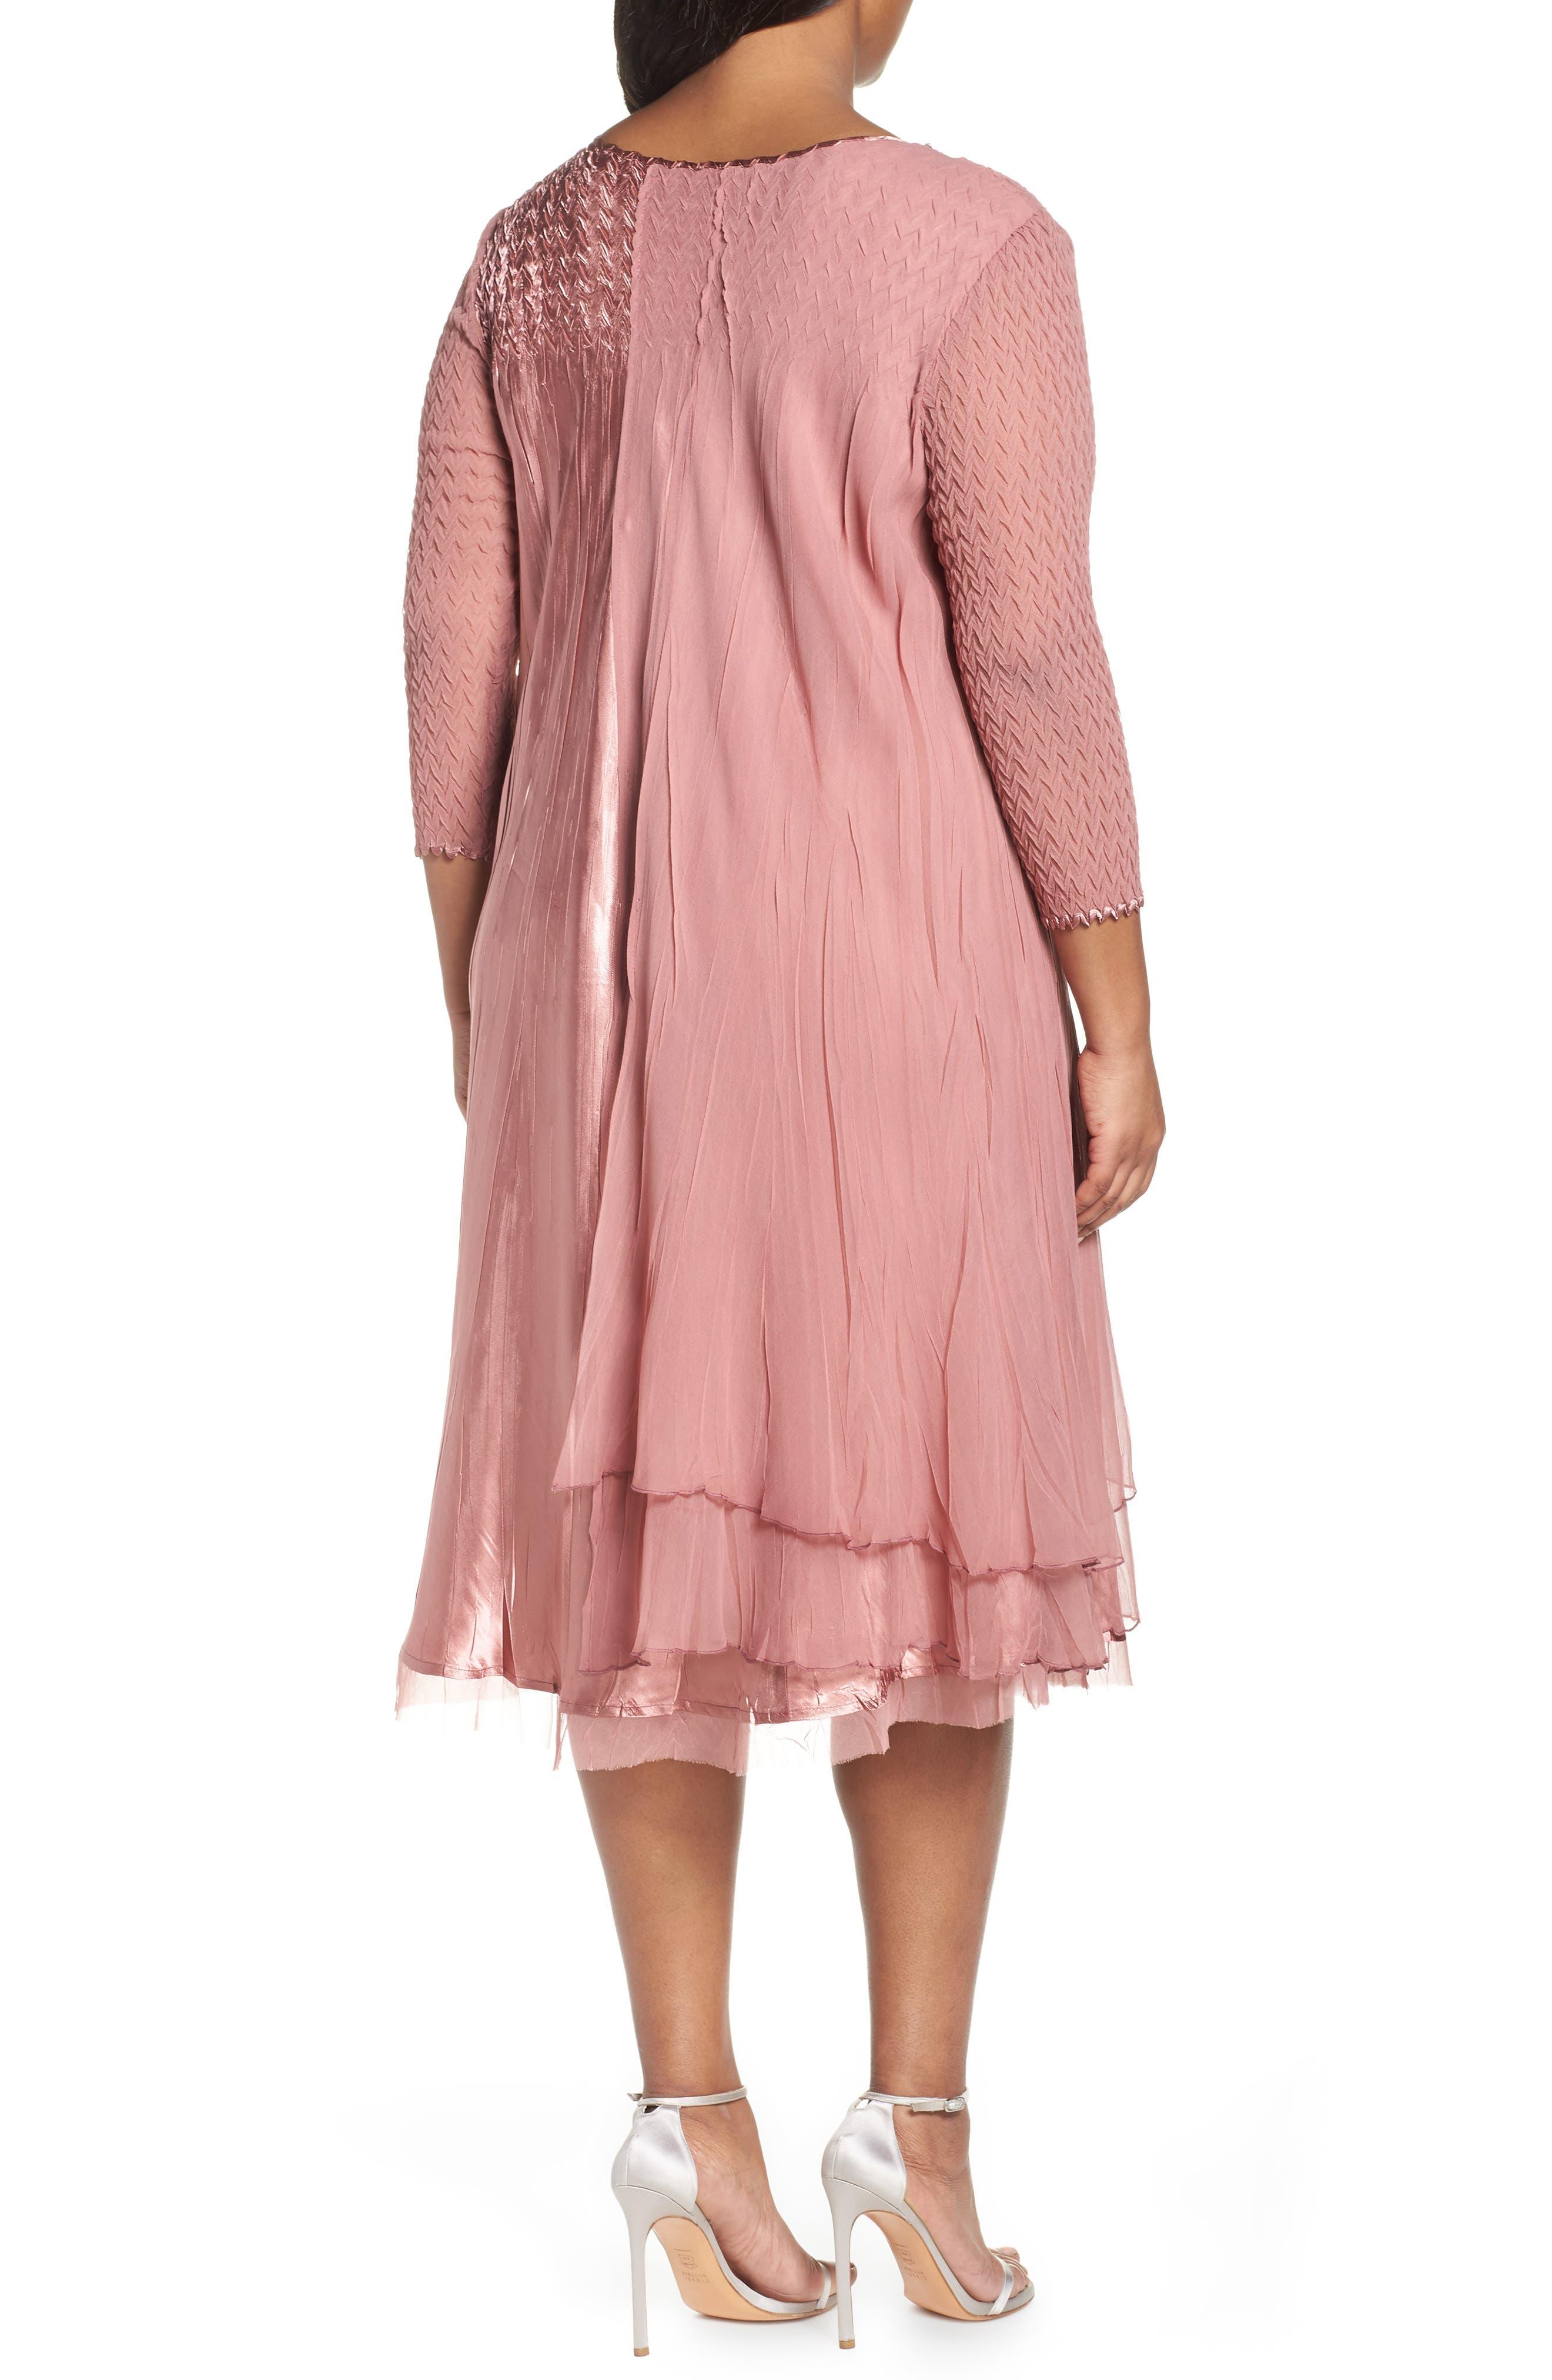 KOMAROV, Tiered A-Line Dress, Alternate thumbnail 2, color, 680